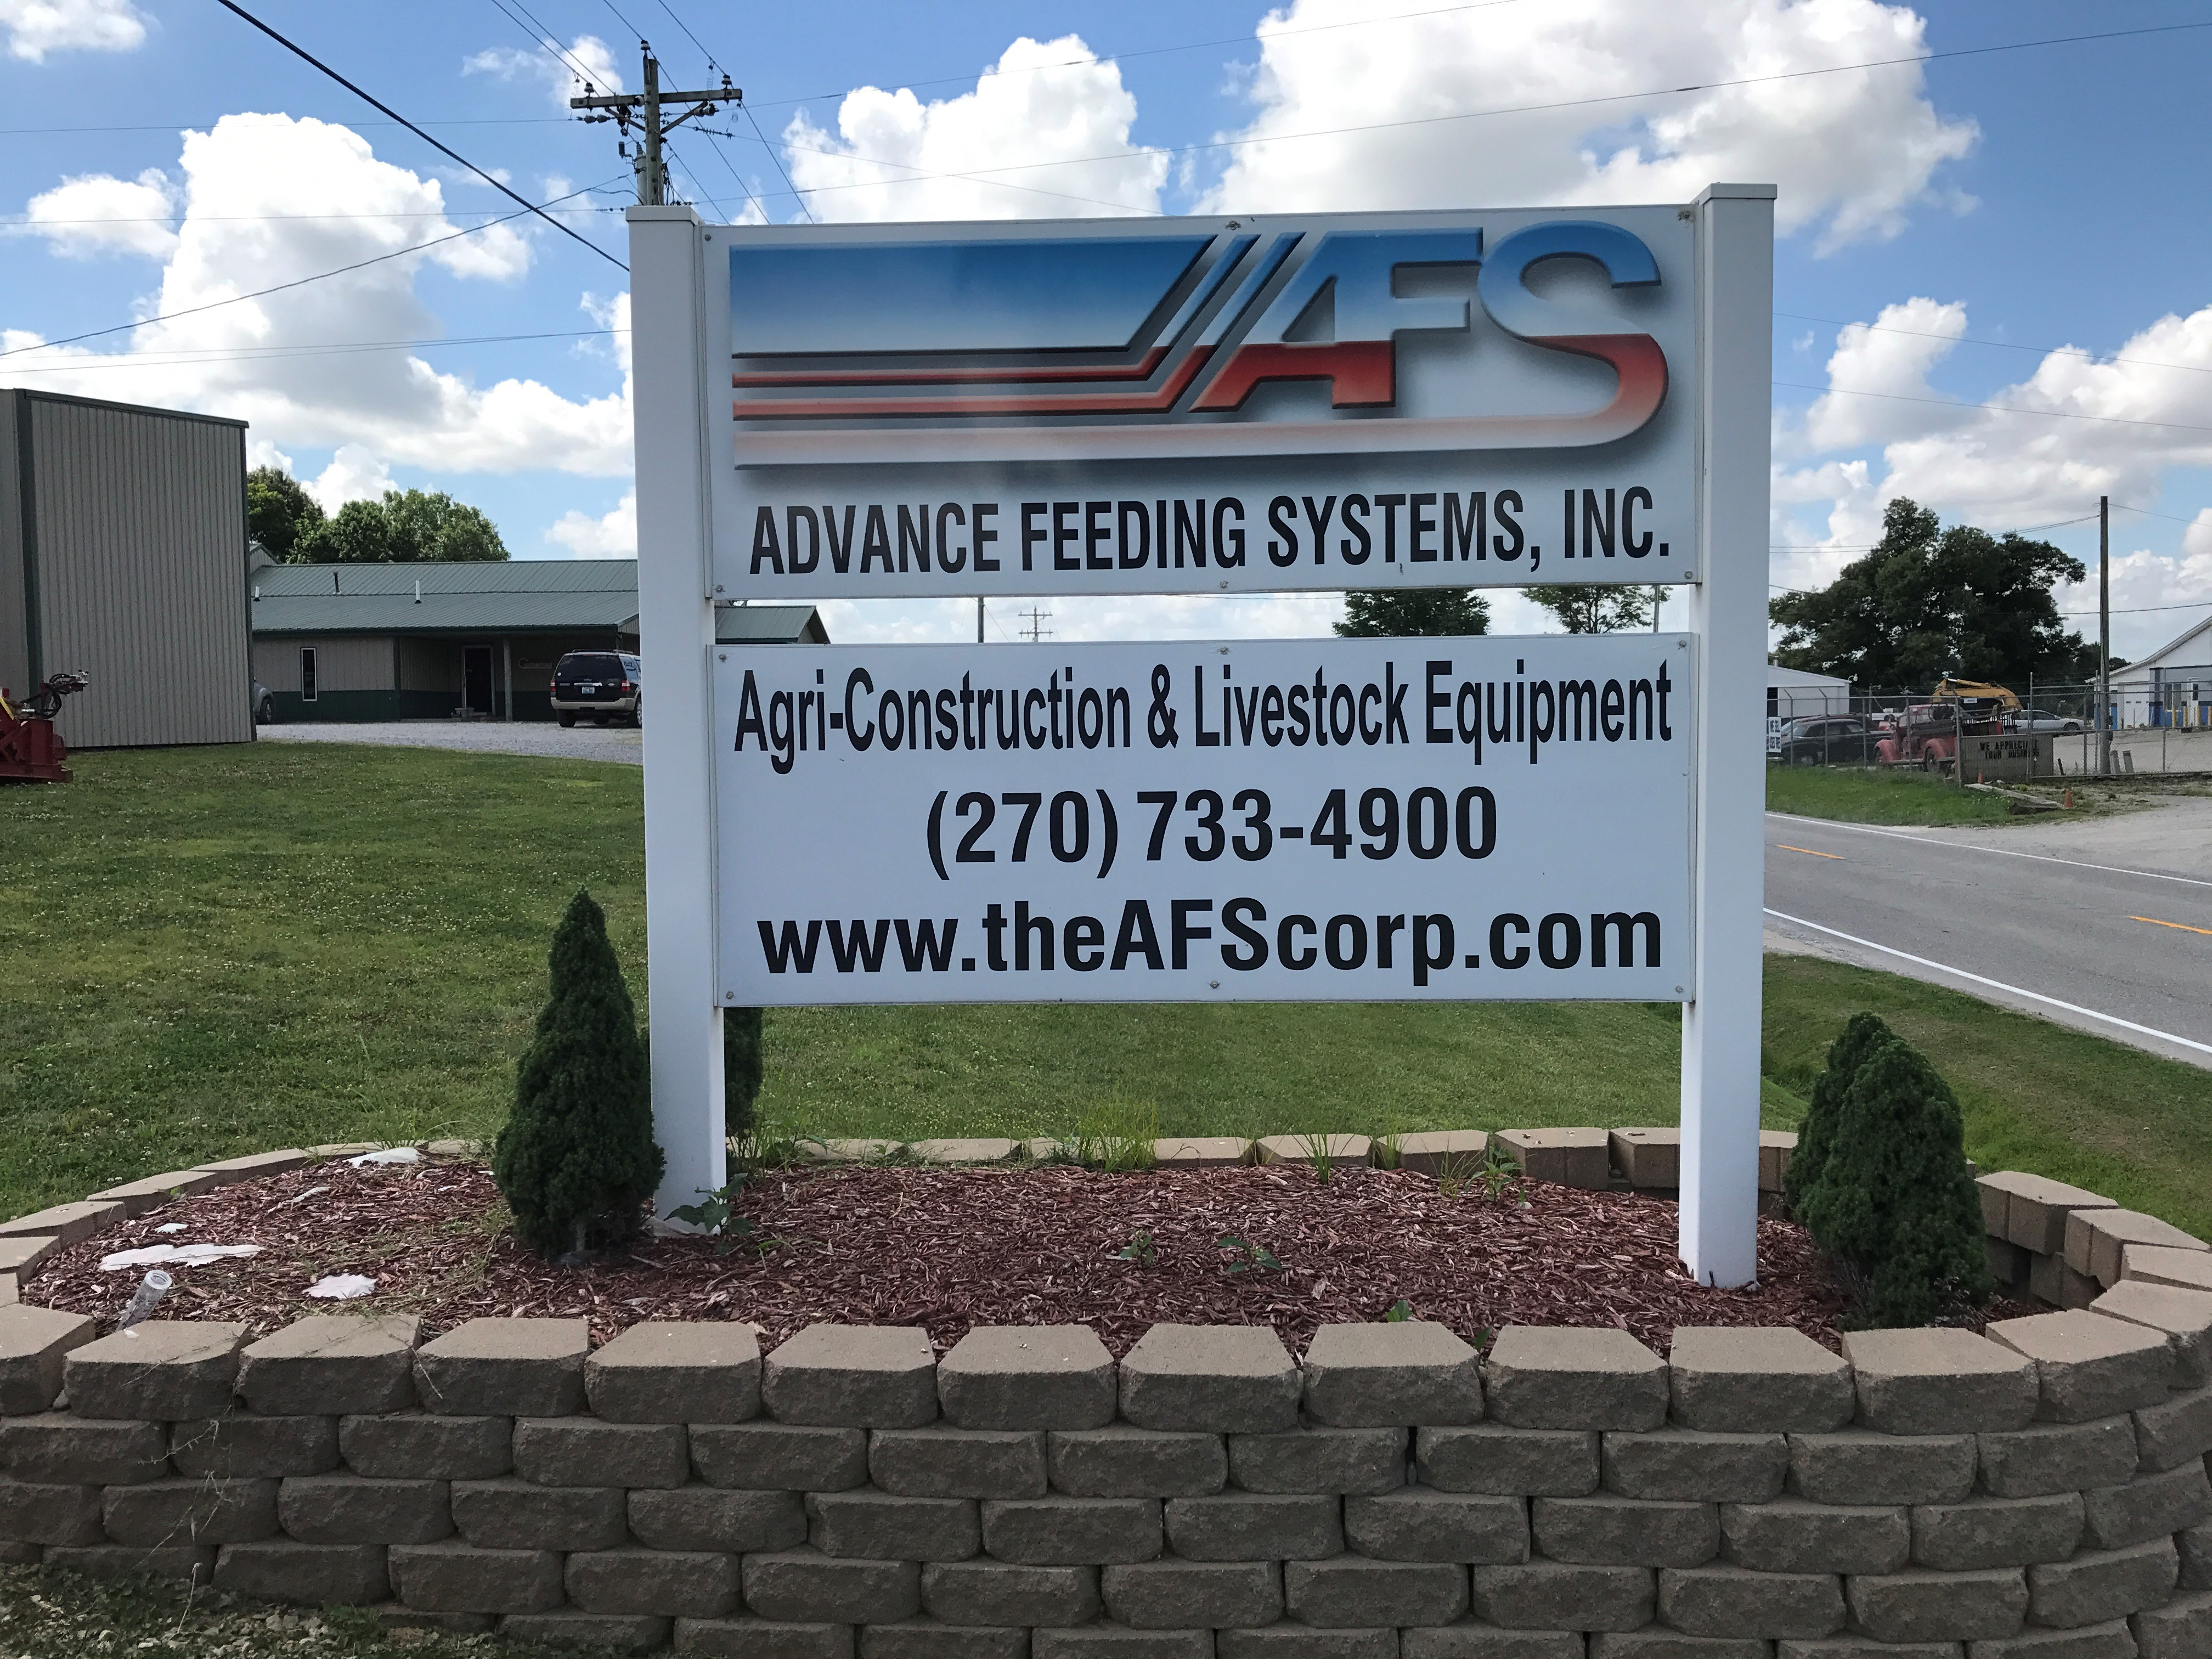 AFS Corporation image 3